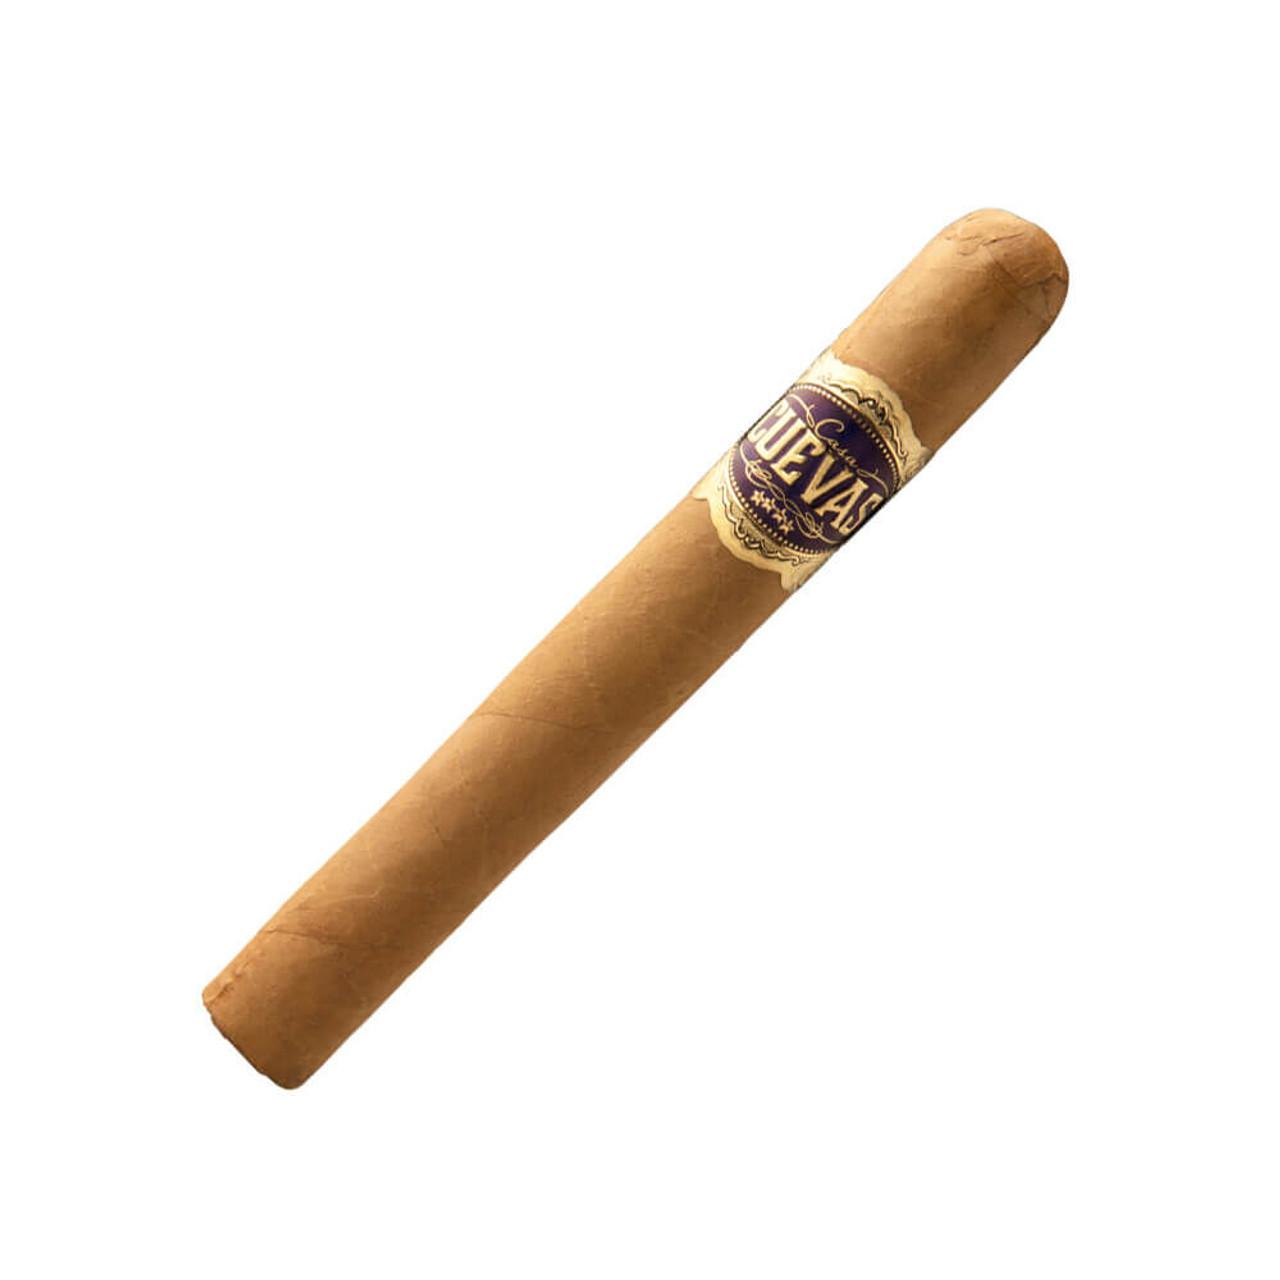 Casa Cuevas Connecticut Toro Cigars - 6 x 50 (Box of 20)